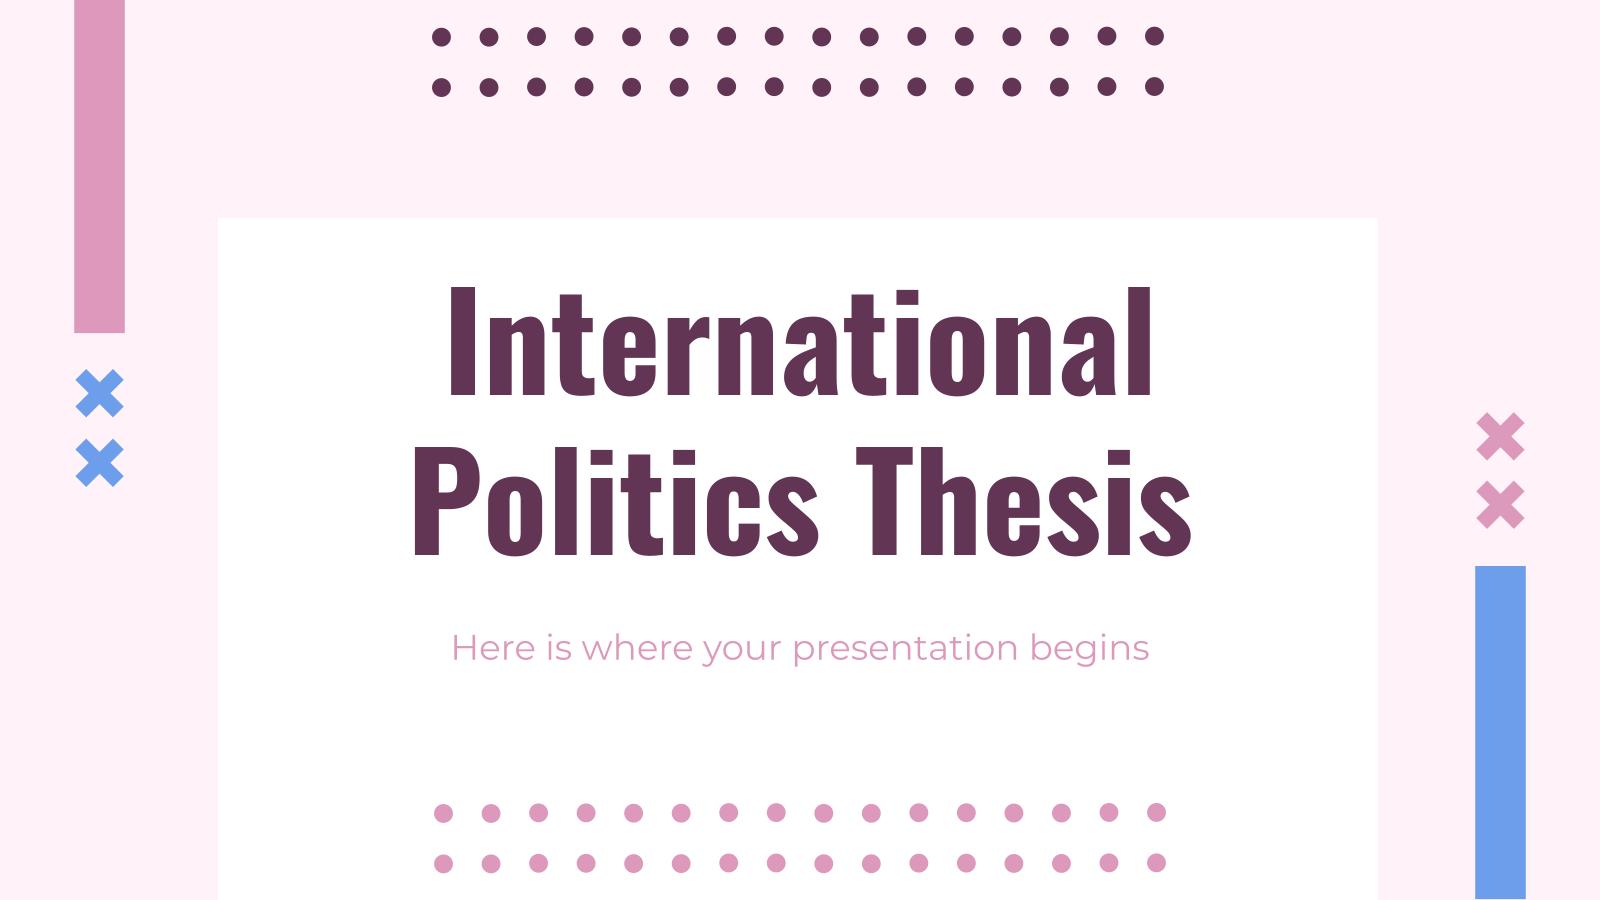 Plantilla de presentación Tesis de política internacional